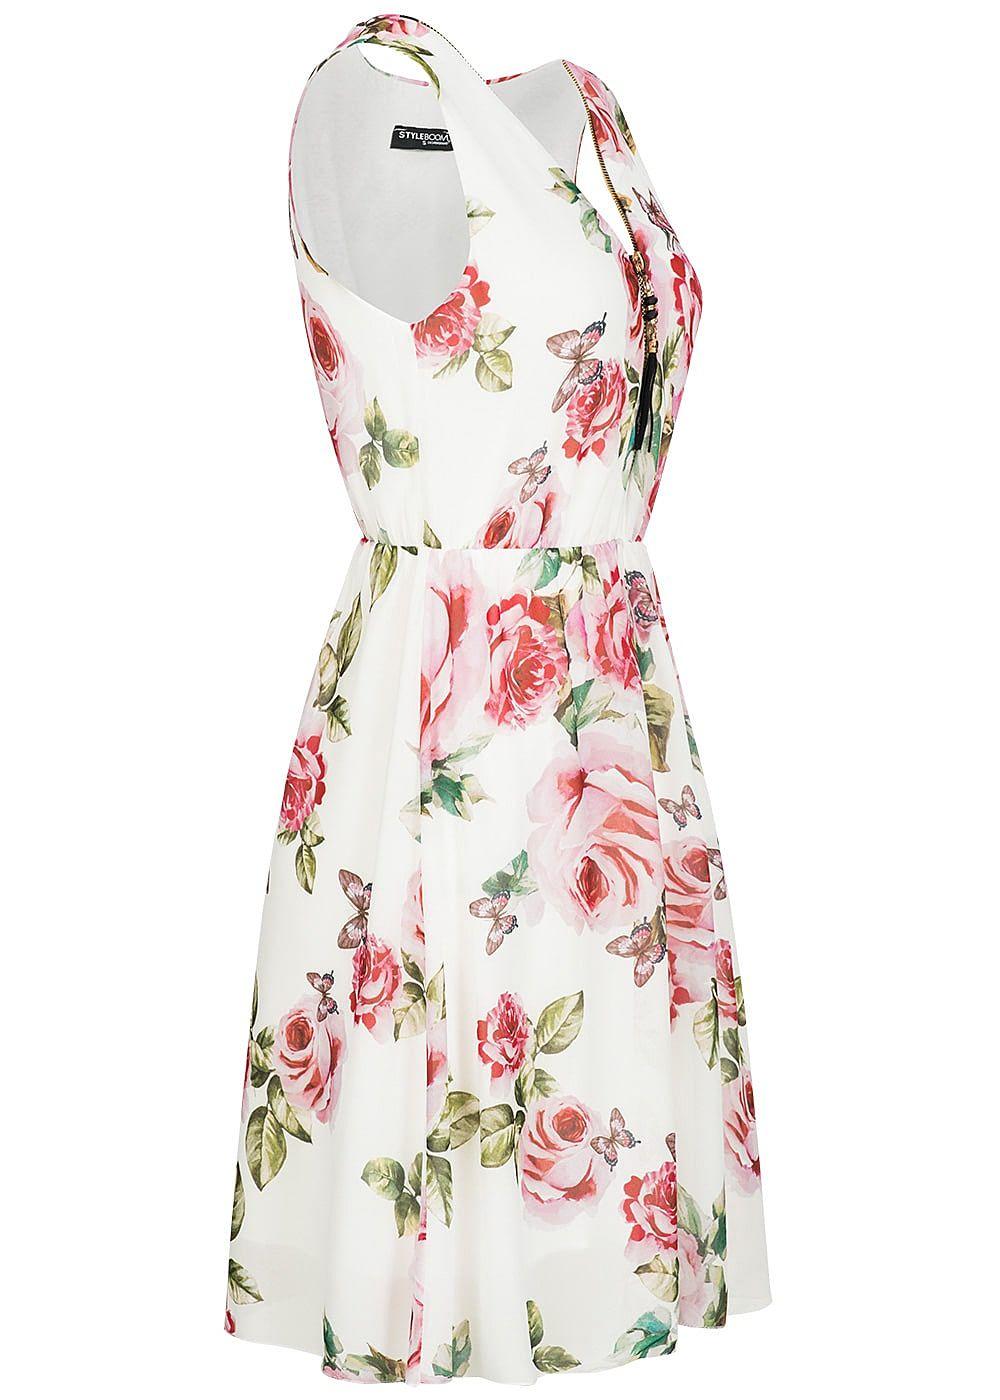 styleboom fashion damen kleid rosen print zipper vorne weiss rosa gr n 77onlineshop. Black Bedroom Furniture Sets. Home Design Ideas